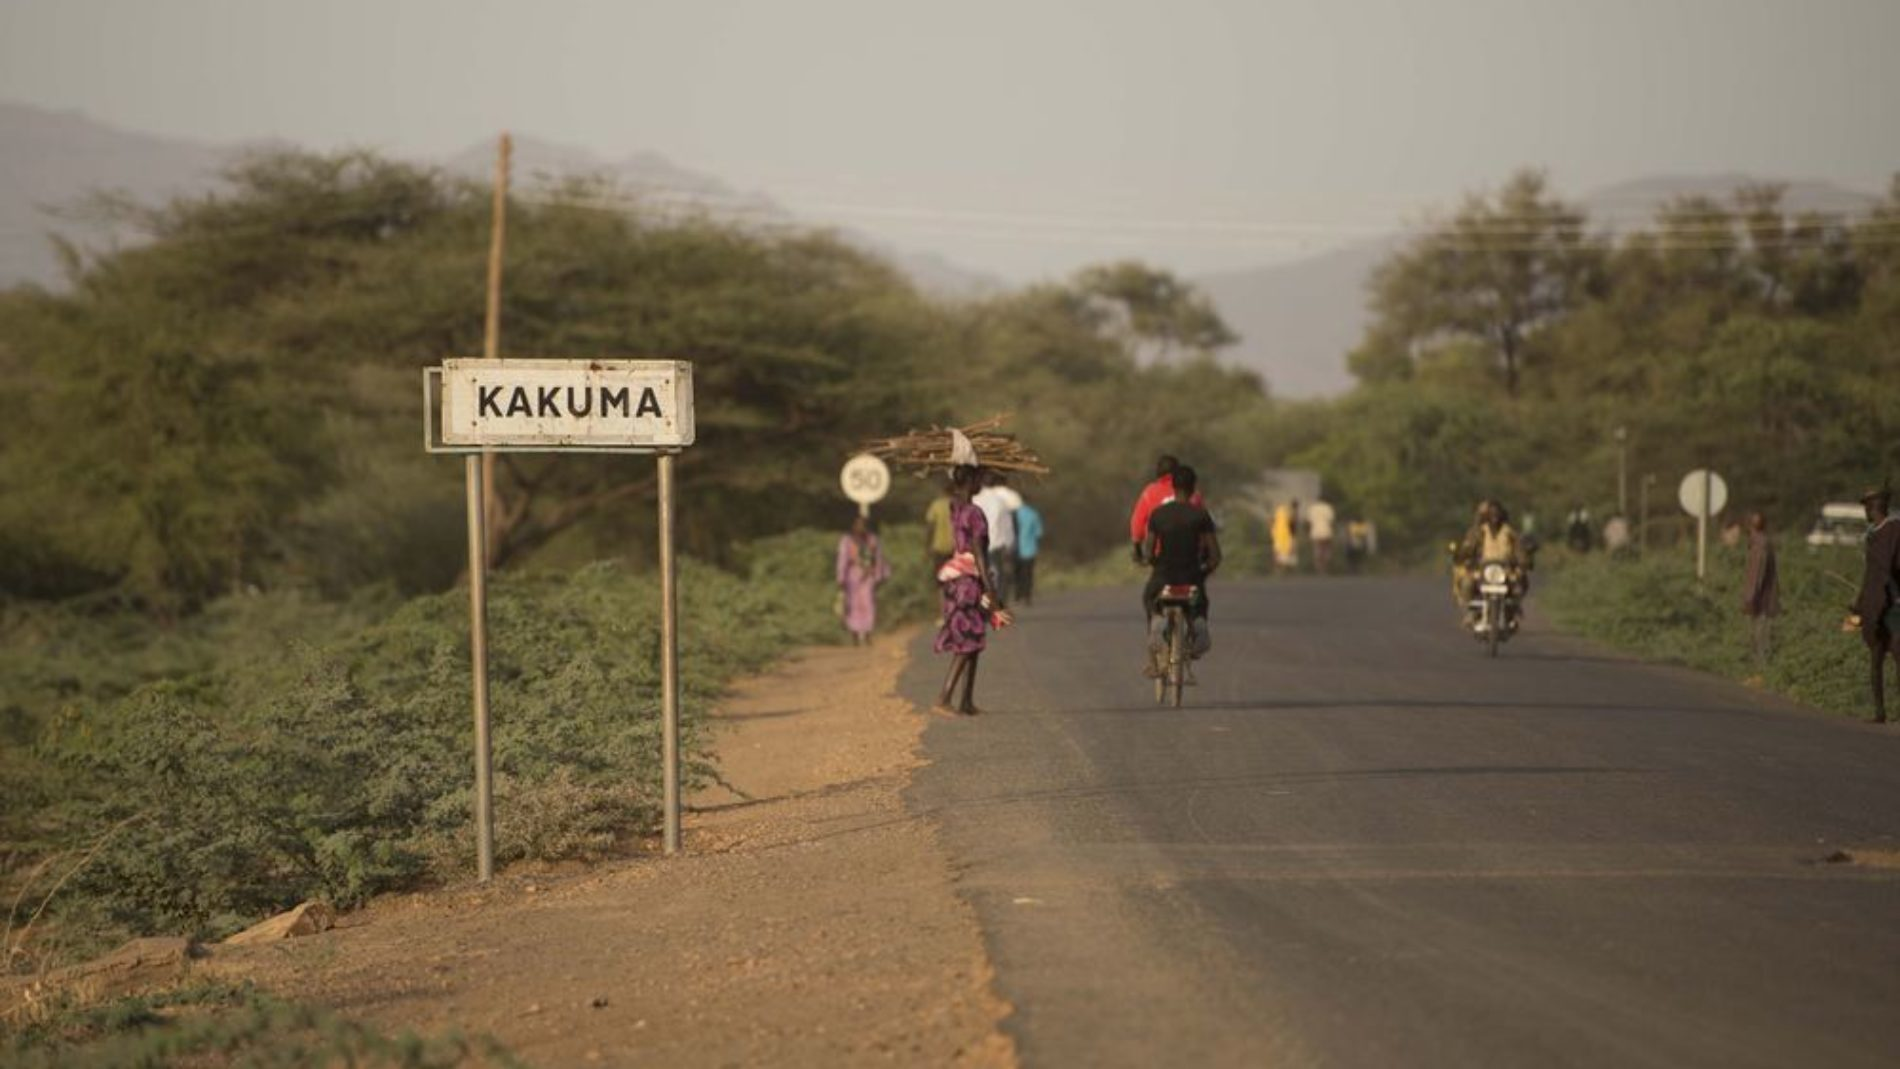 Kenya : 90 réfugiés dont des Burundais accueillis à Kakuma